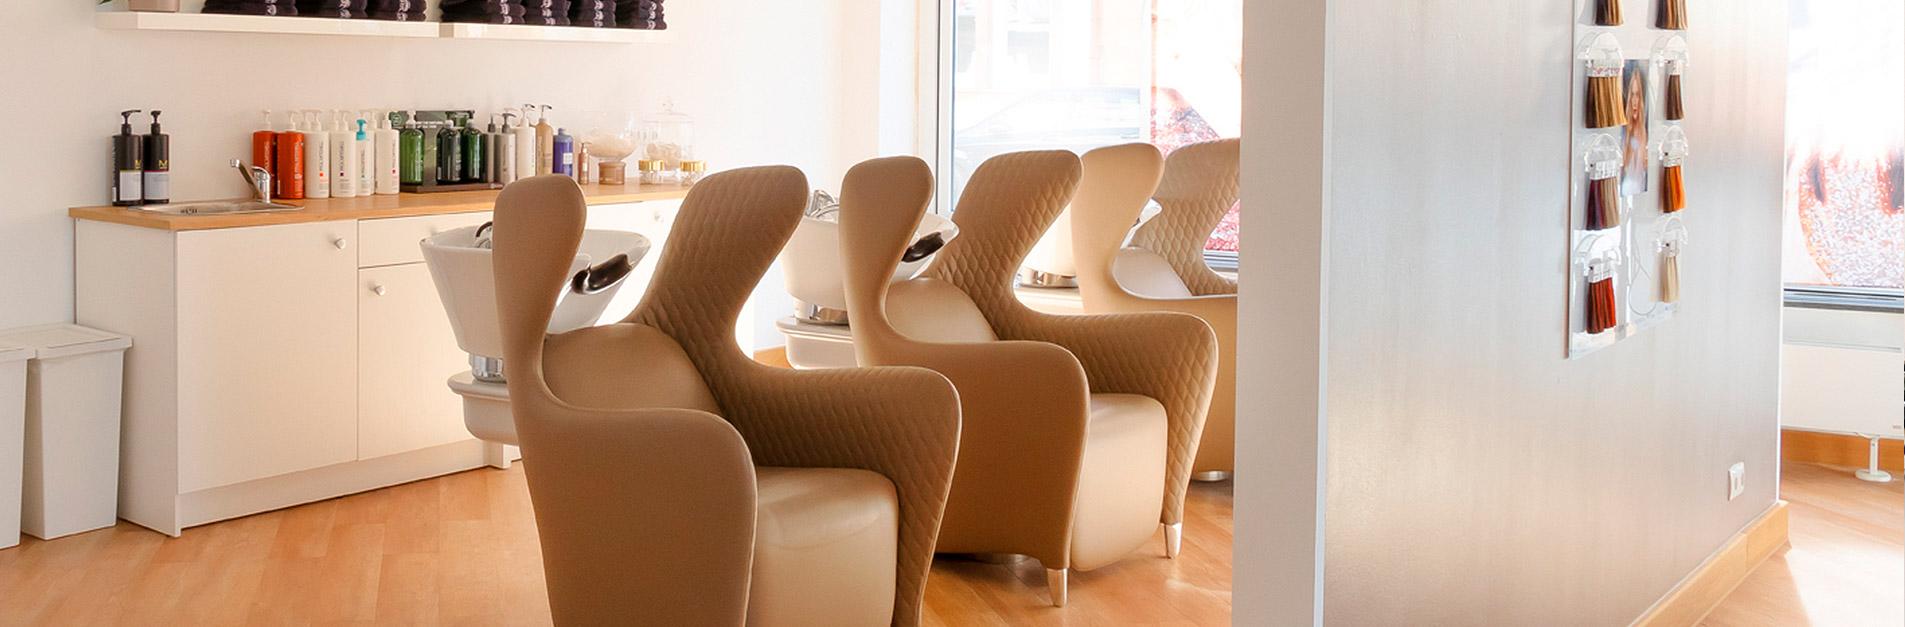 Friseur, Beautyloft Mutlu, Frankenthal